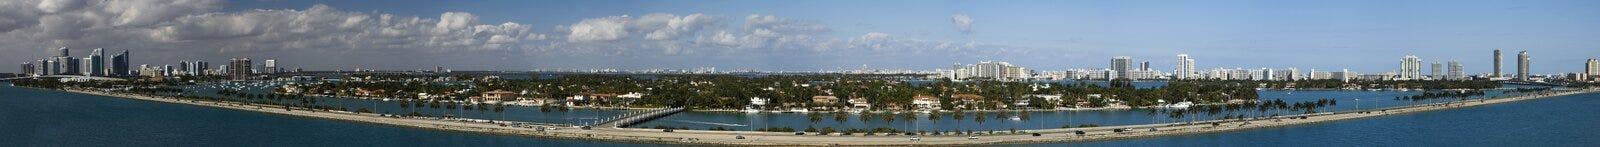 Panorama de Miami Fotografia de Stock